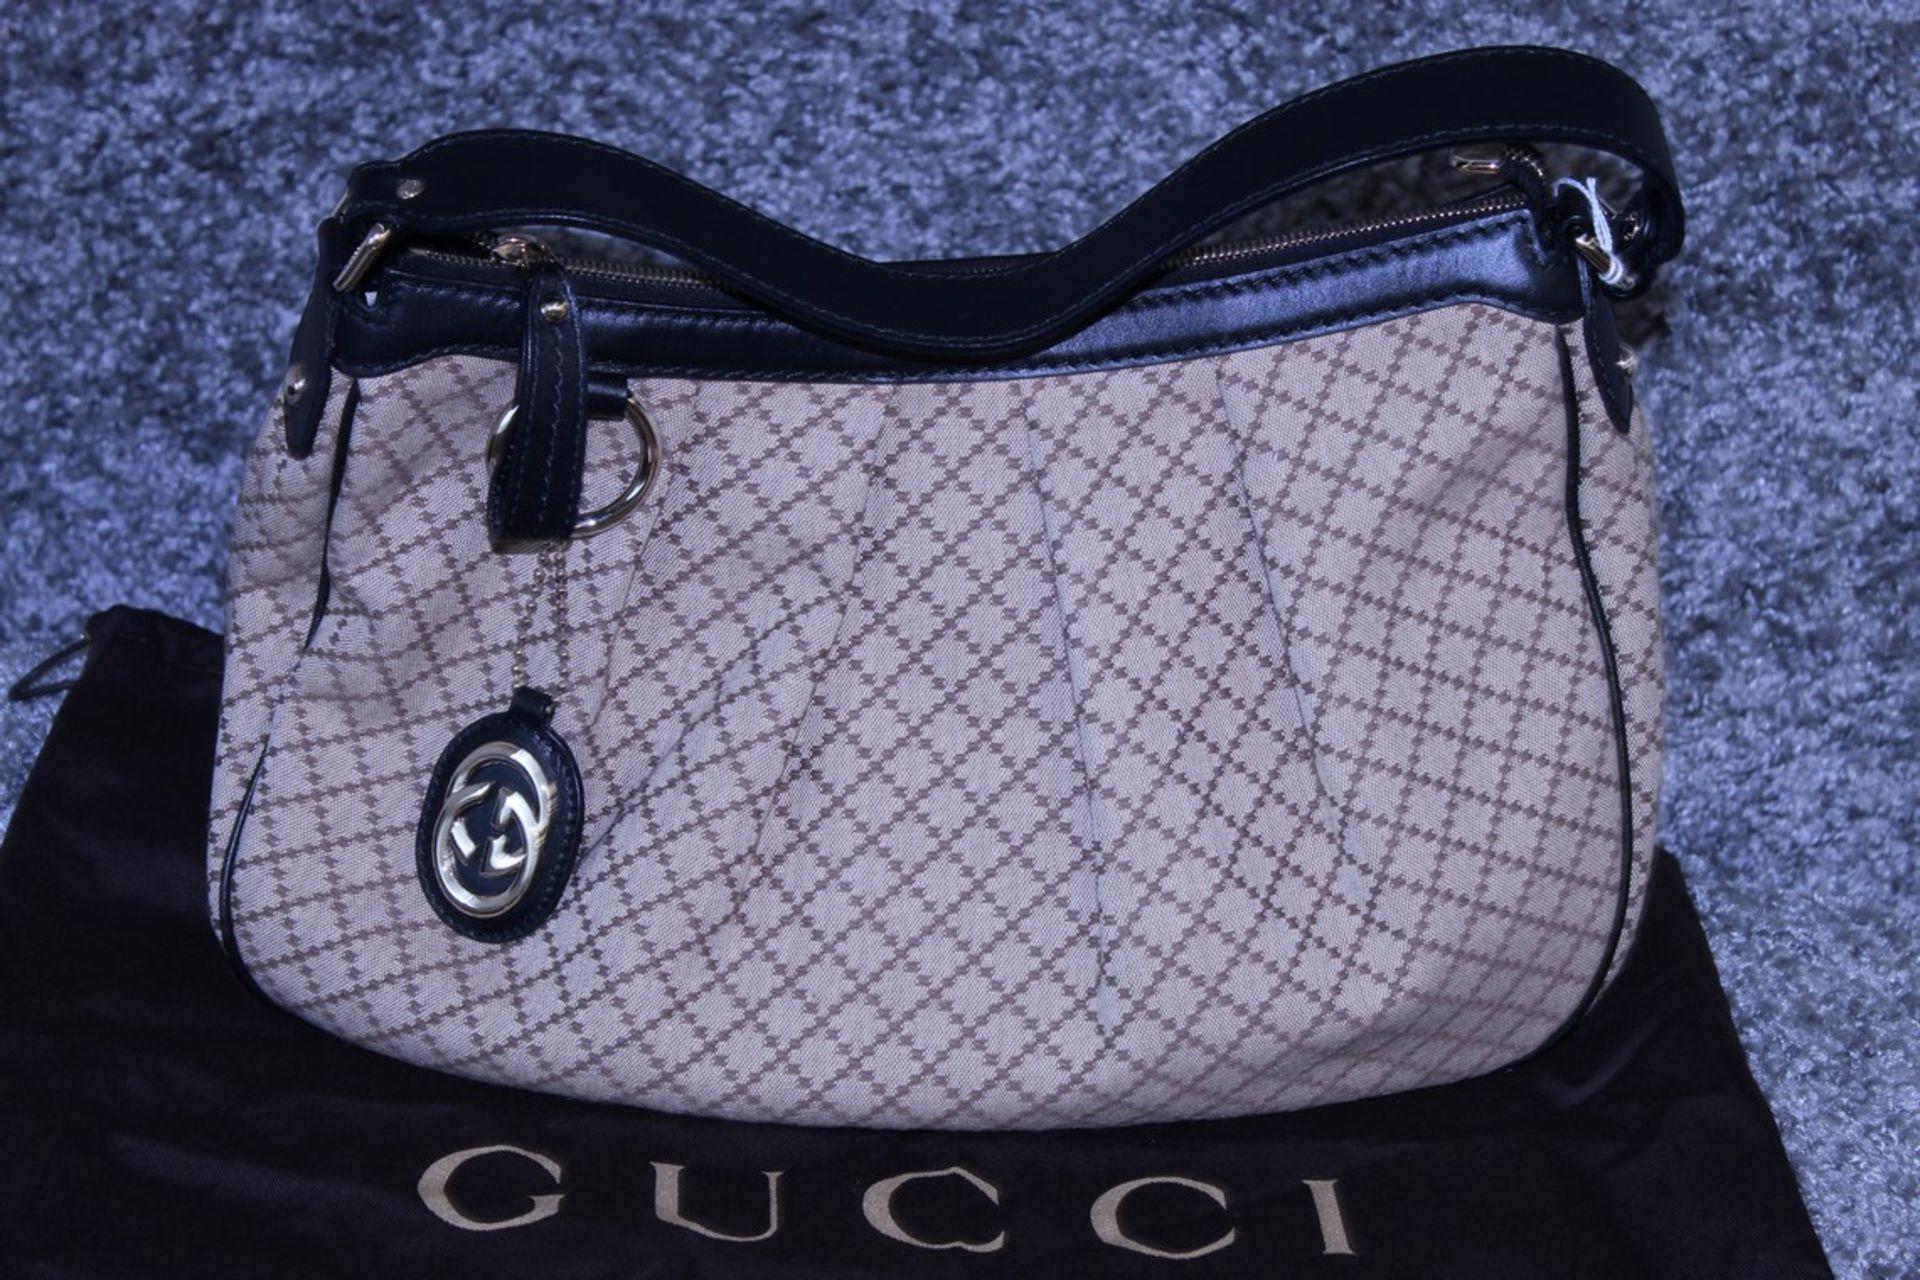 RRP £1,500 Gucci Sukey Medium Shoulder Bag, Beige/Black Diamante Canvas, 37.5X26X10Cm (Production - Image 2 of 4